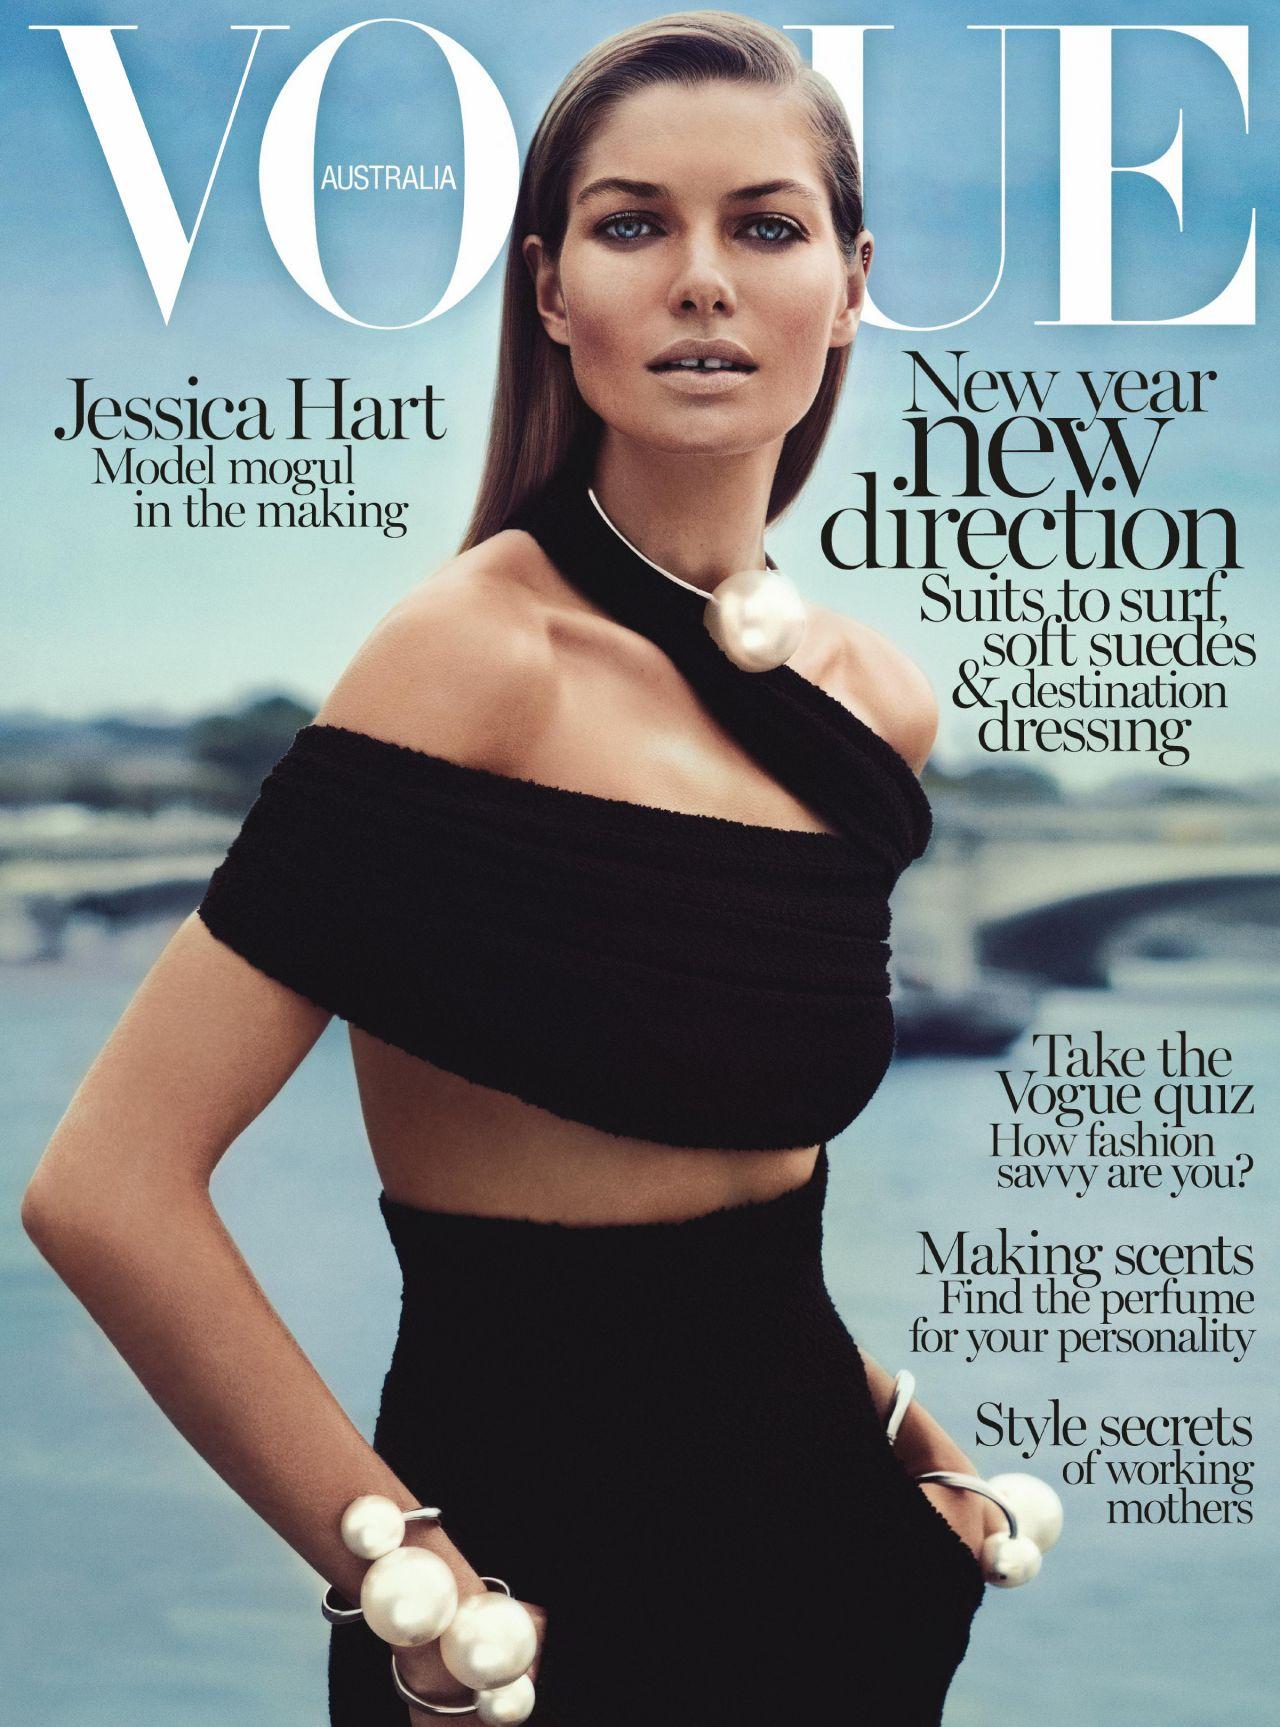 Jessica Hart - VOGUE Magazine (Australia) - January 2014 Issue